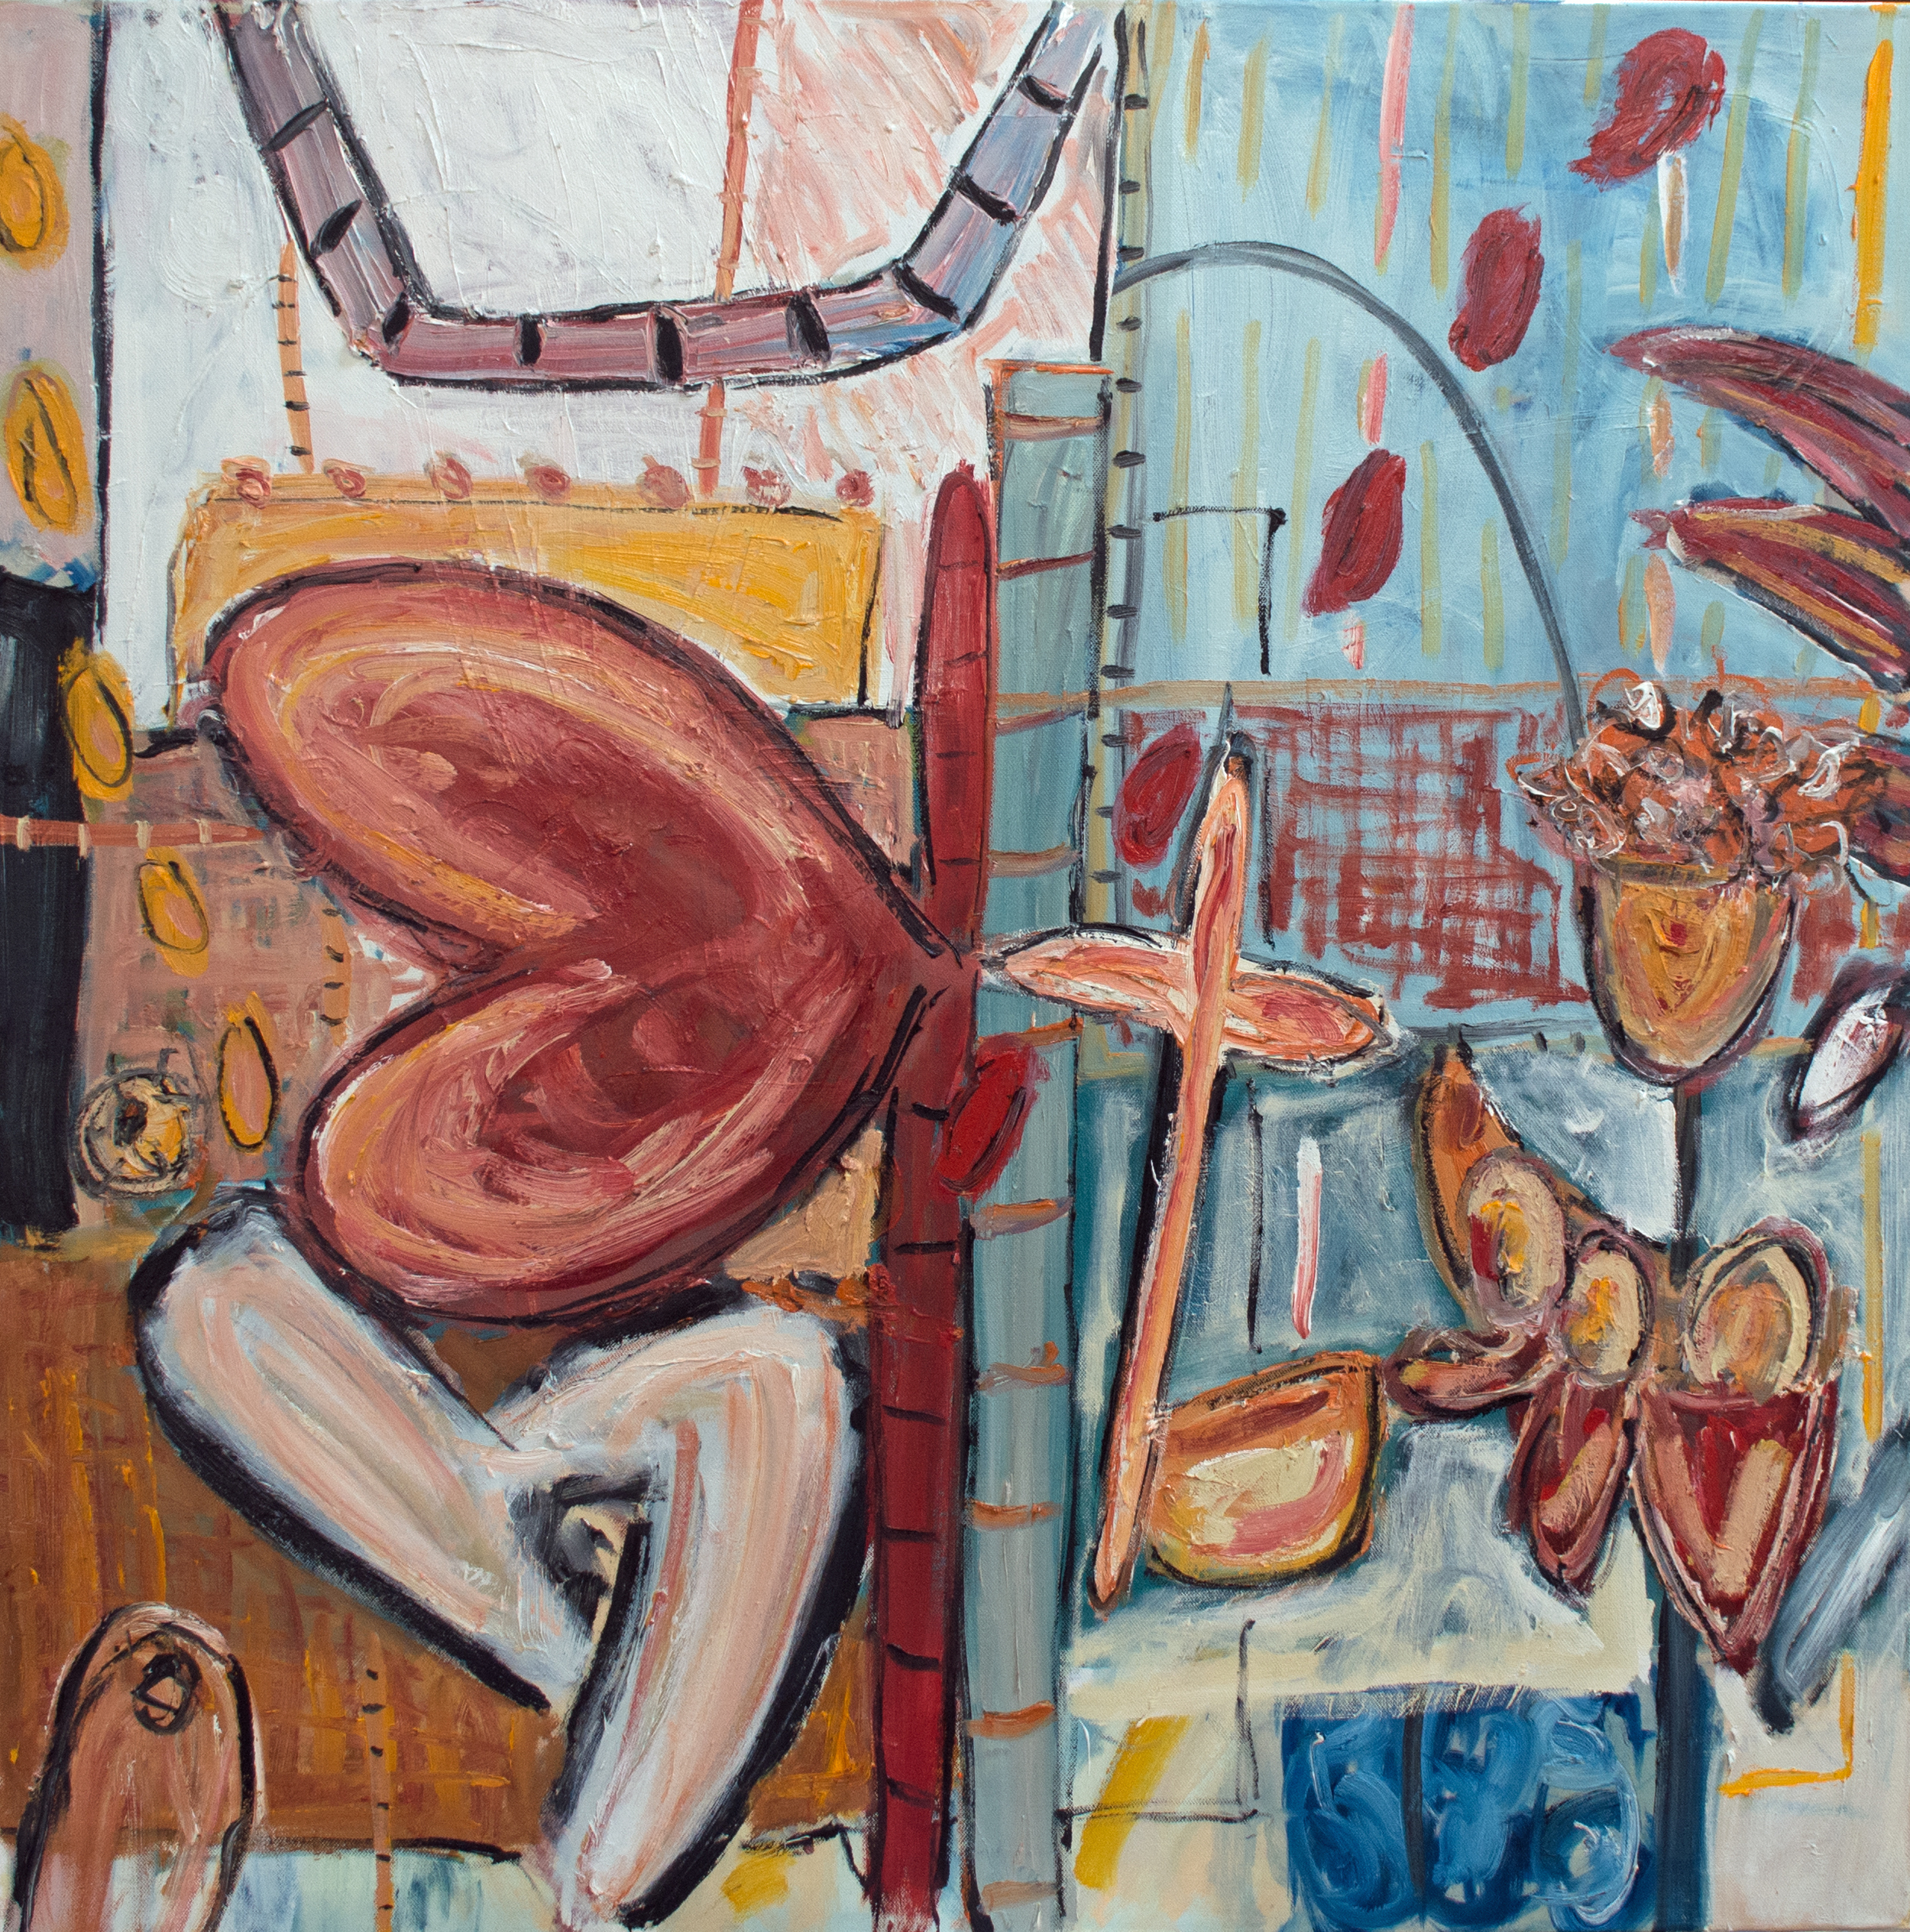 Alec Cumming, Cross My Heart, oil on canvas, 100x100cm, 2015.jpg